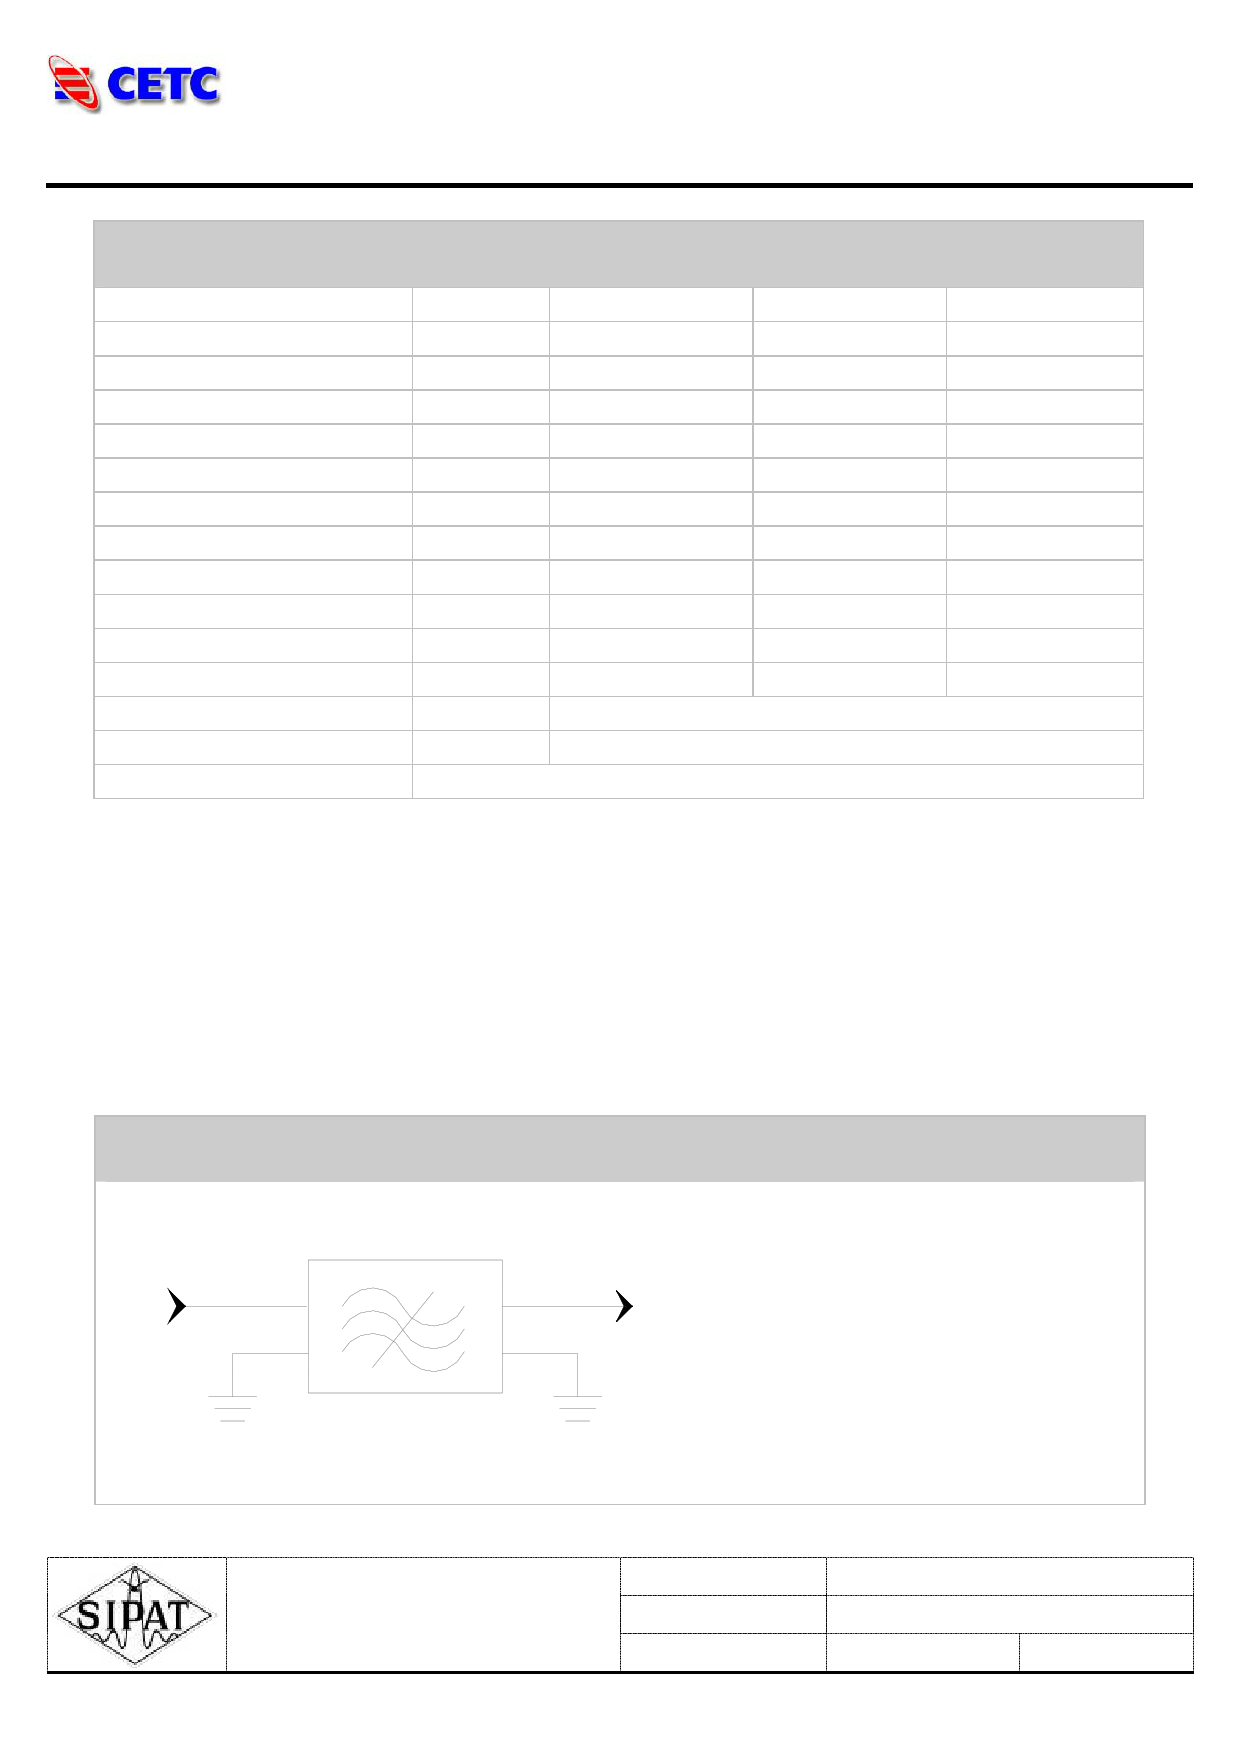 LBN70A16 datasheet